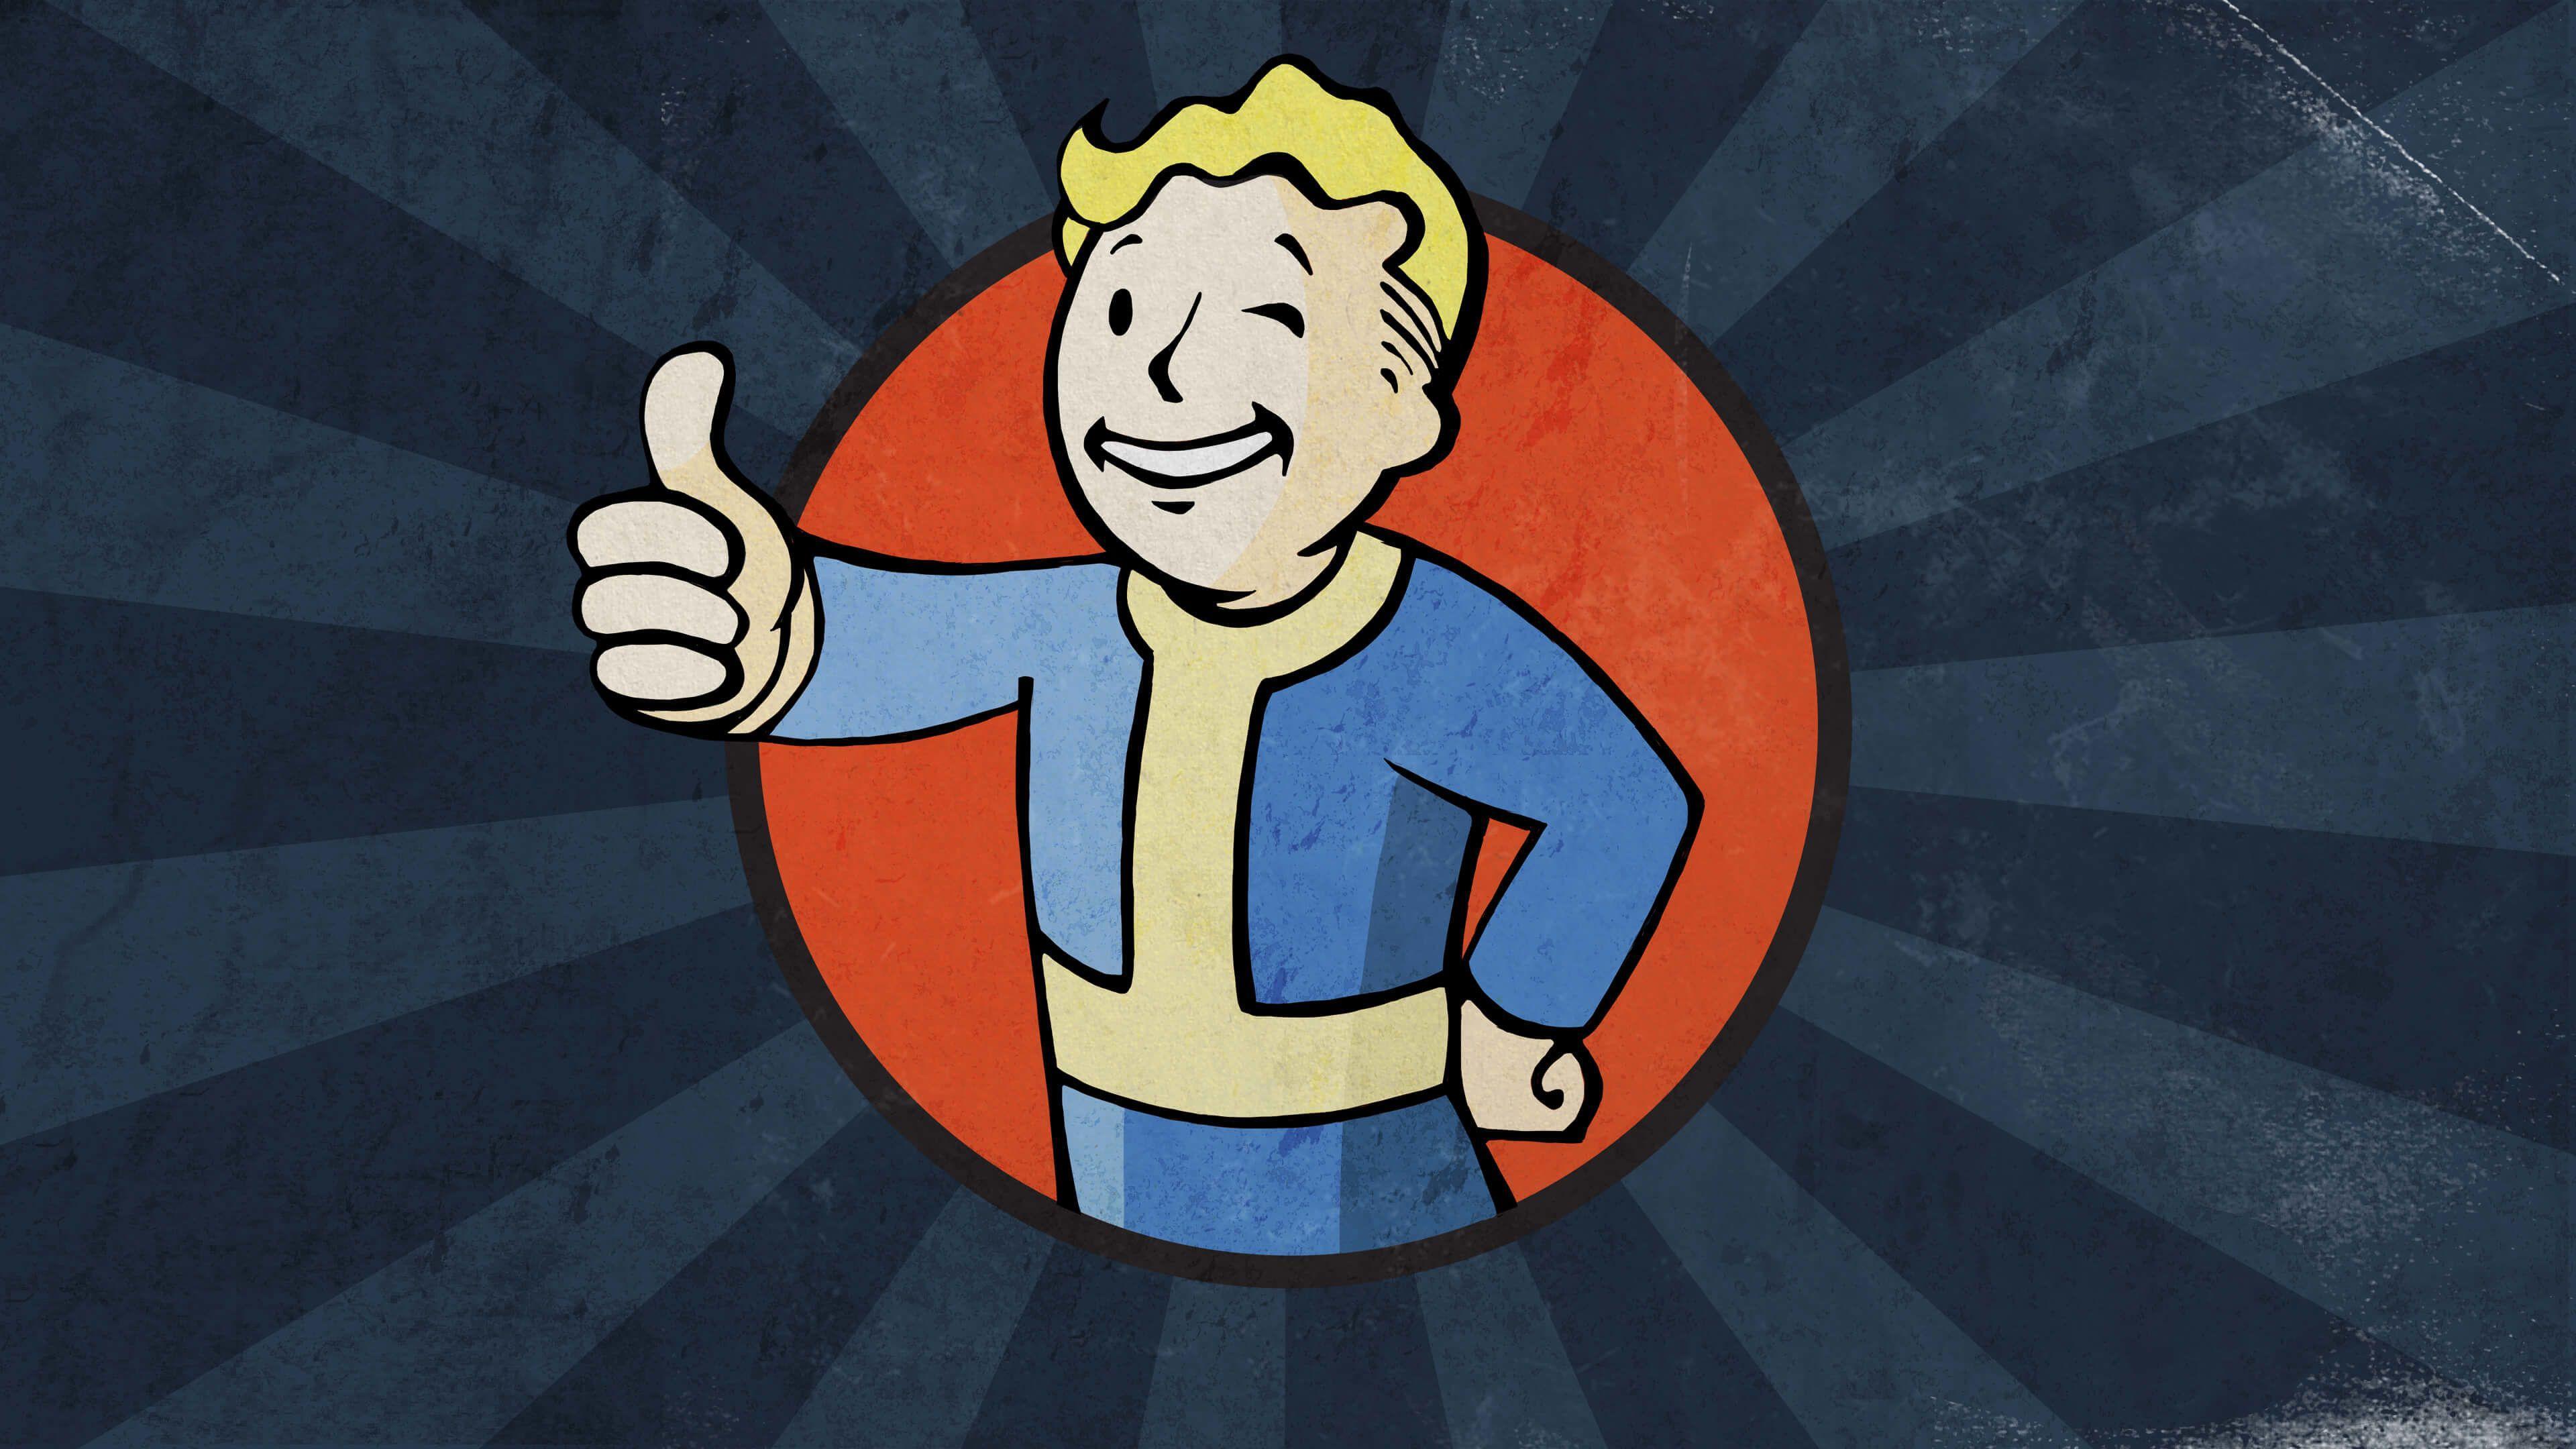 Fall Out Boy Wallpaper Desktop Fallout Shelter Wallpapers Wallpaper Cave